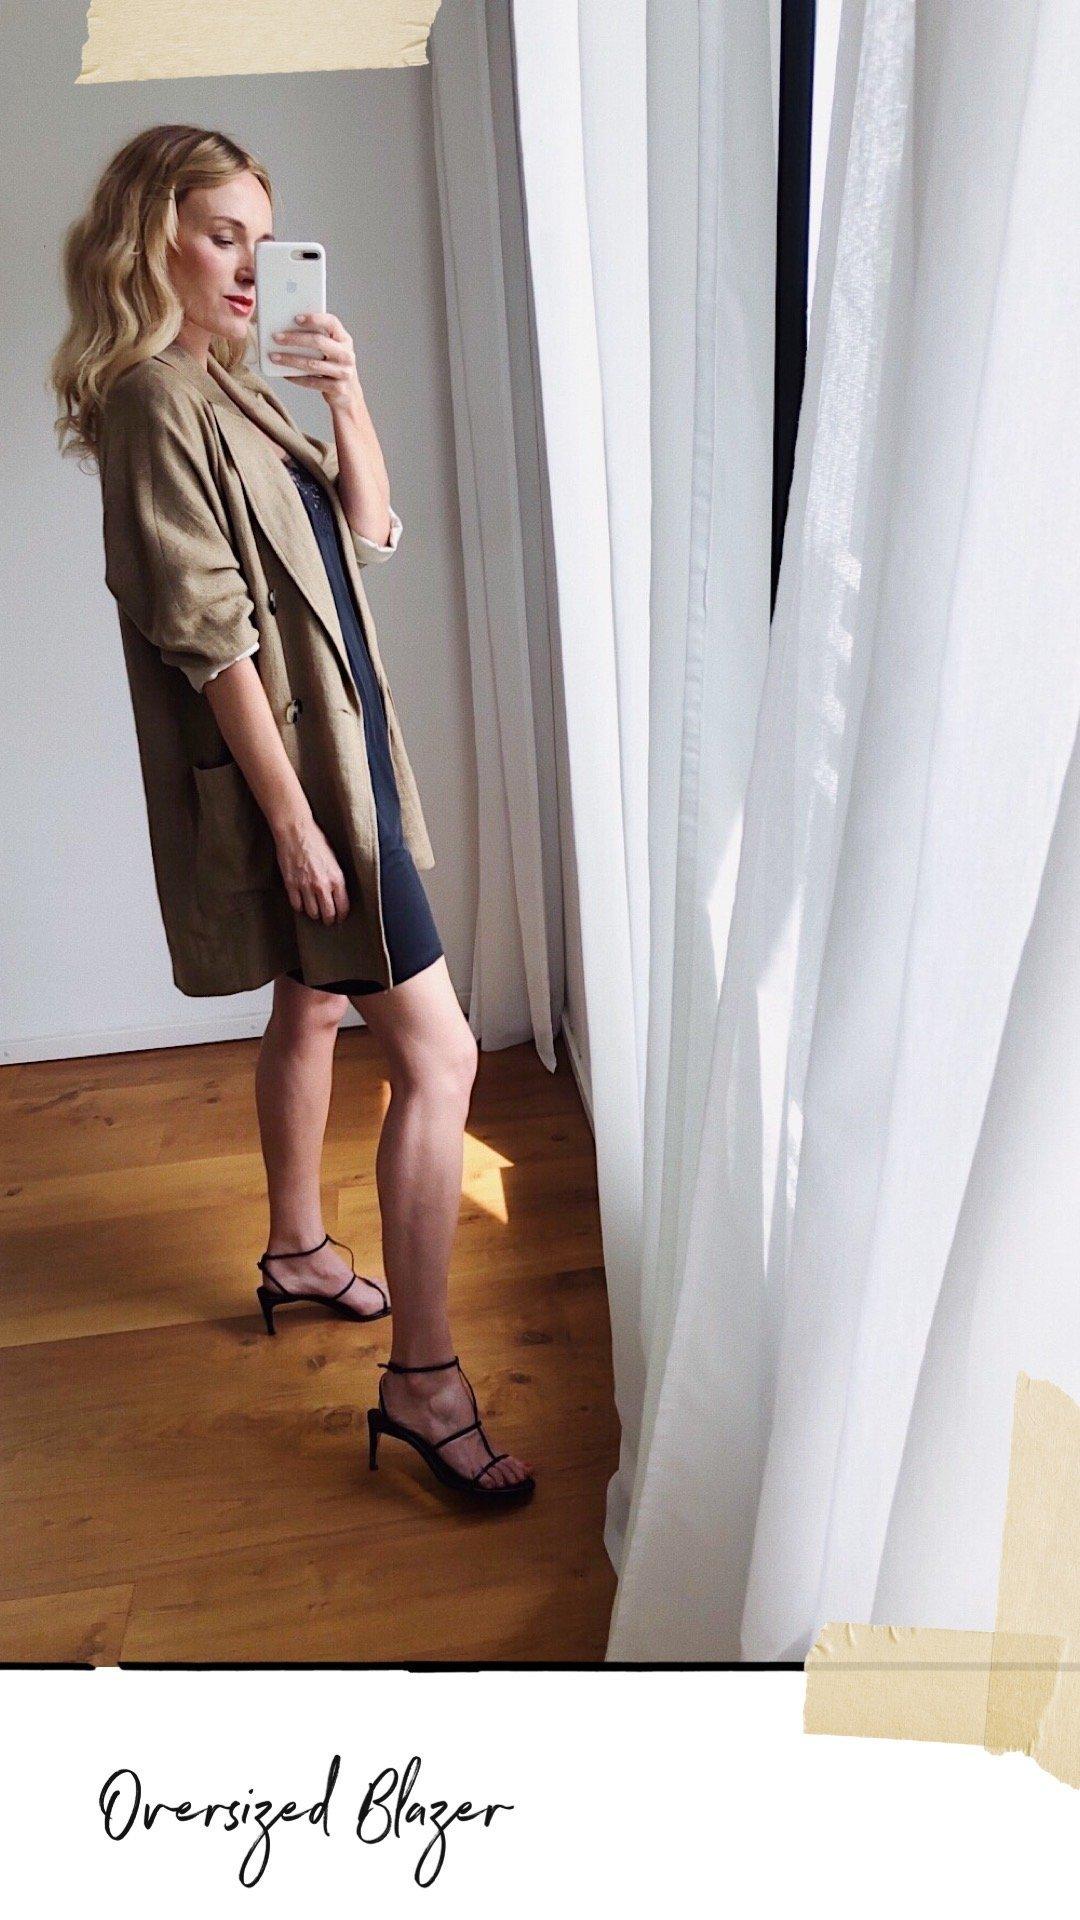 Oversize-Blazer-Urlaubskoffer-Capsule-Wardrobe-Nowshine-ü-40-blog-ue-40-blog-ü-30-blog-ue-30-blog-fashionblog